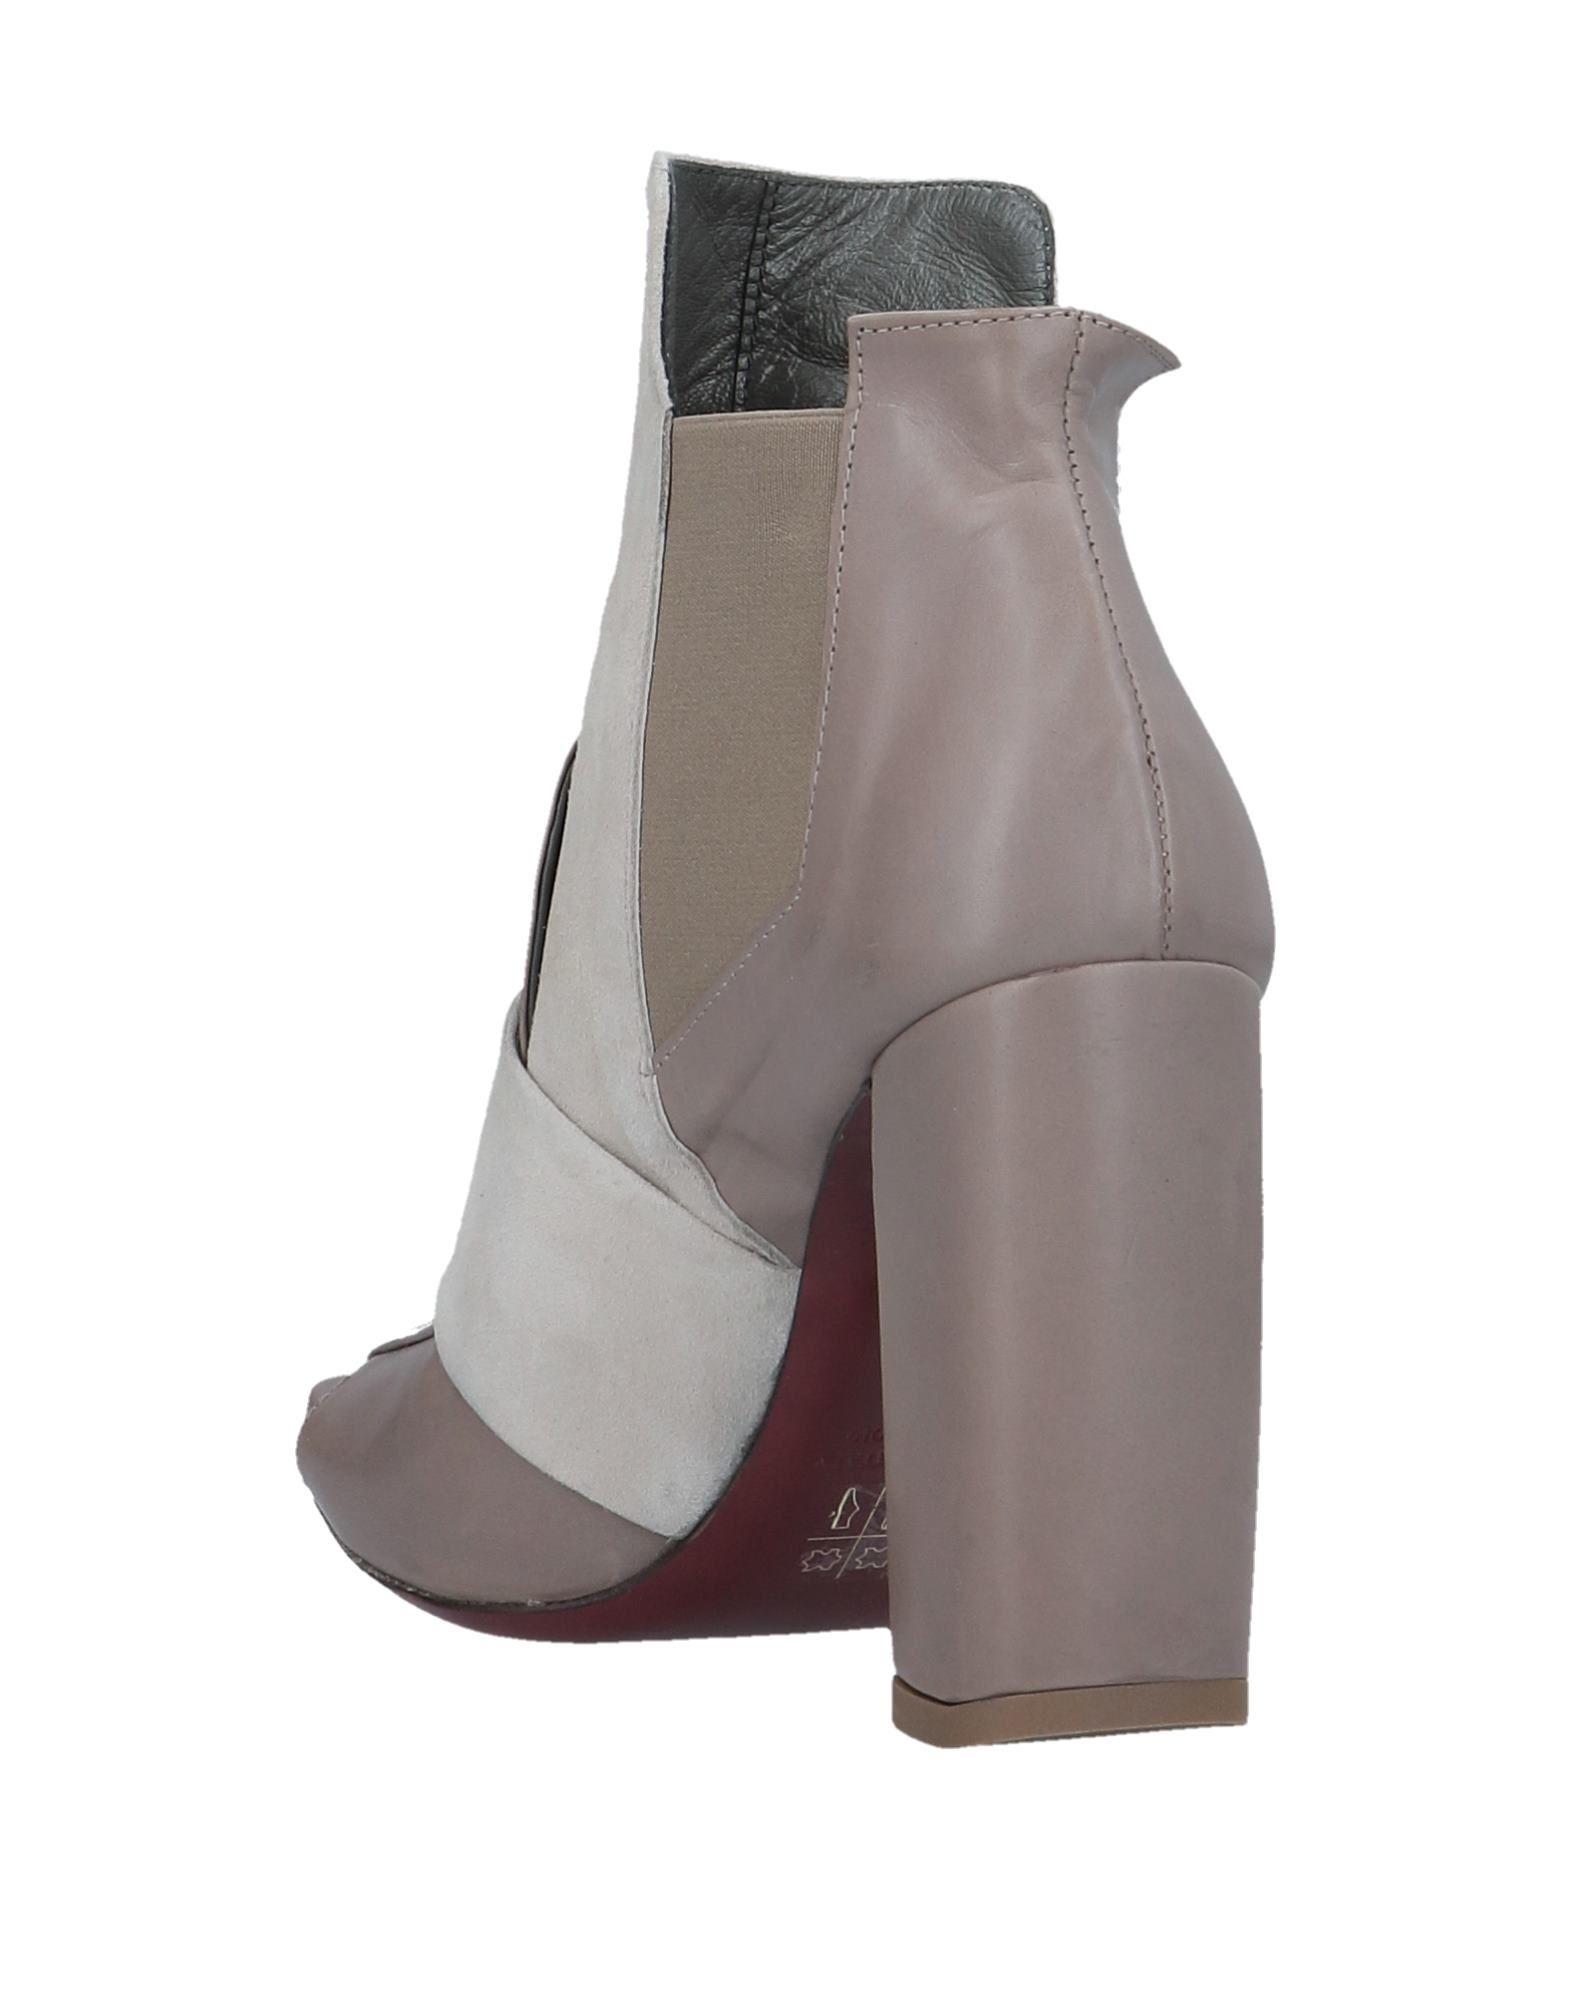 Ixos Stiefelette strapazierfähige Damen  11536832PMGut aussehende strapazierfähige Stiefelette Schuhe 3a11af